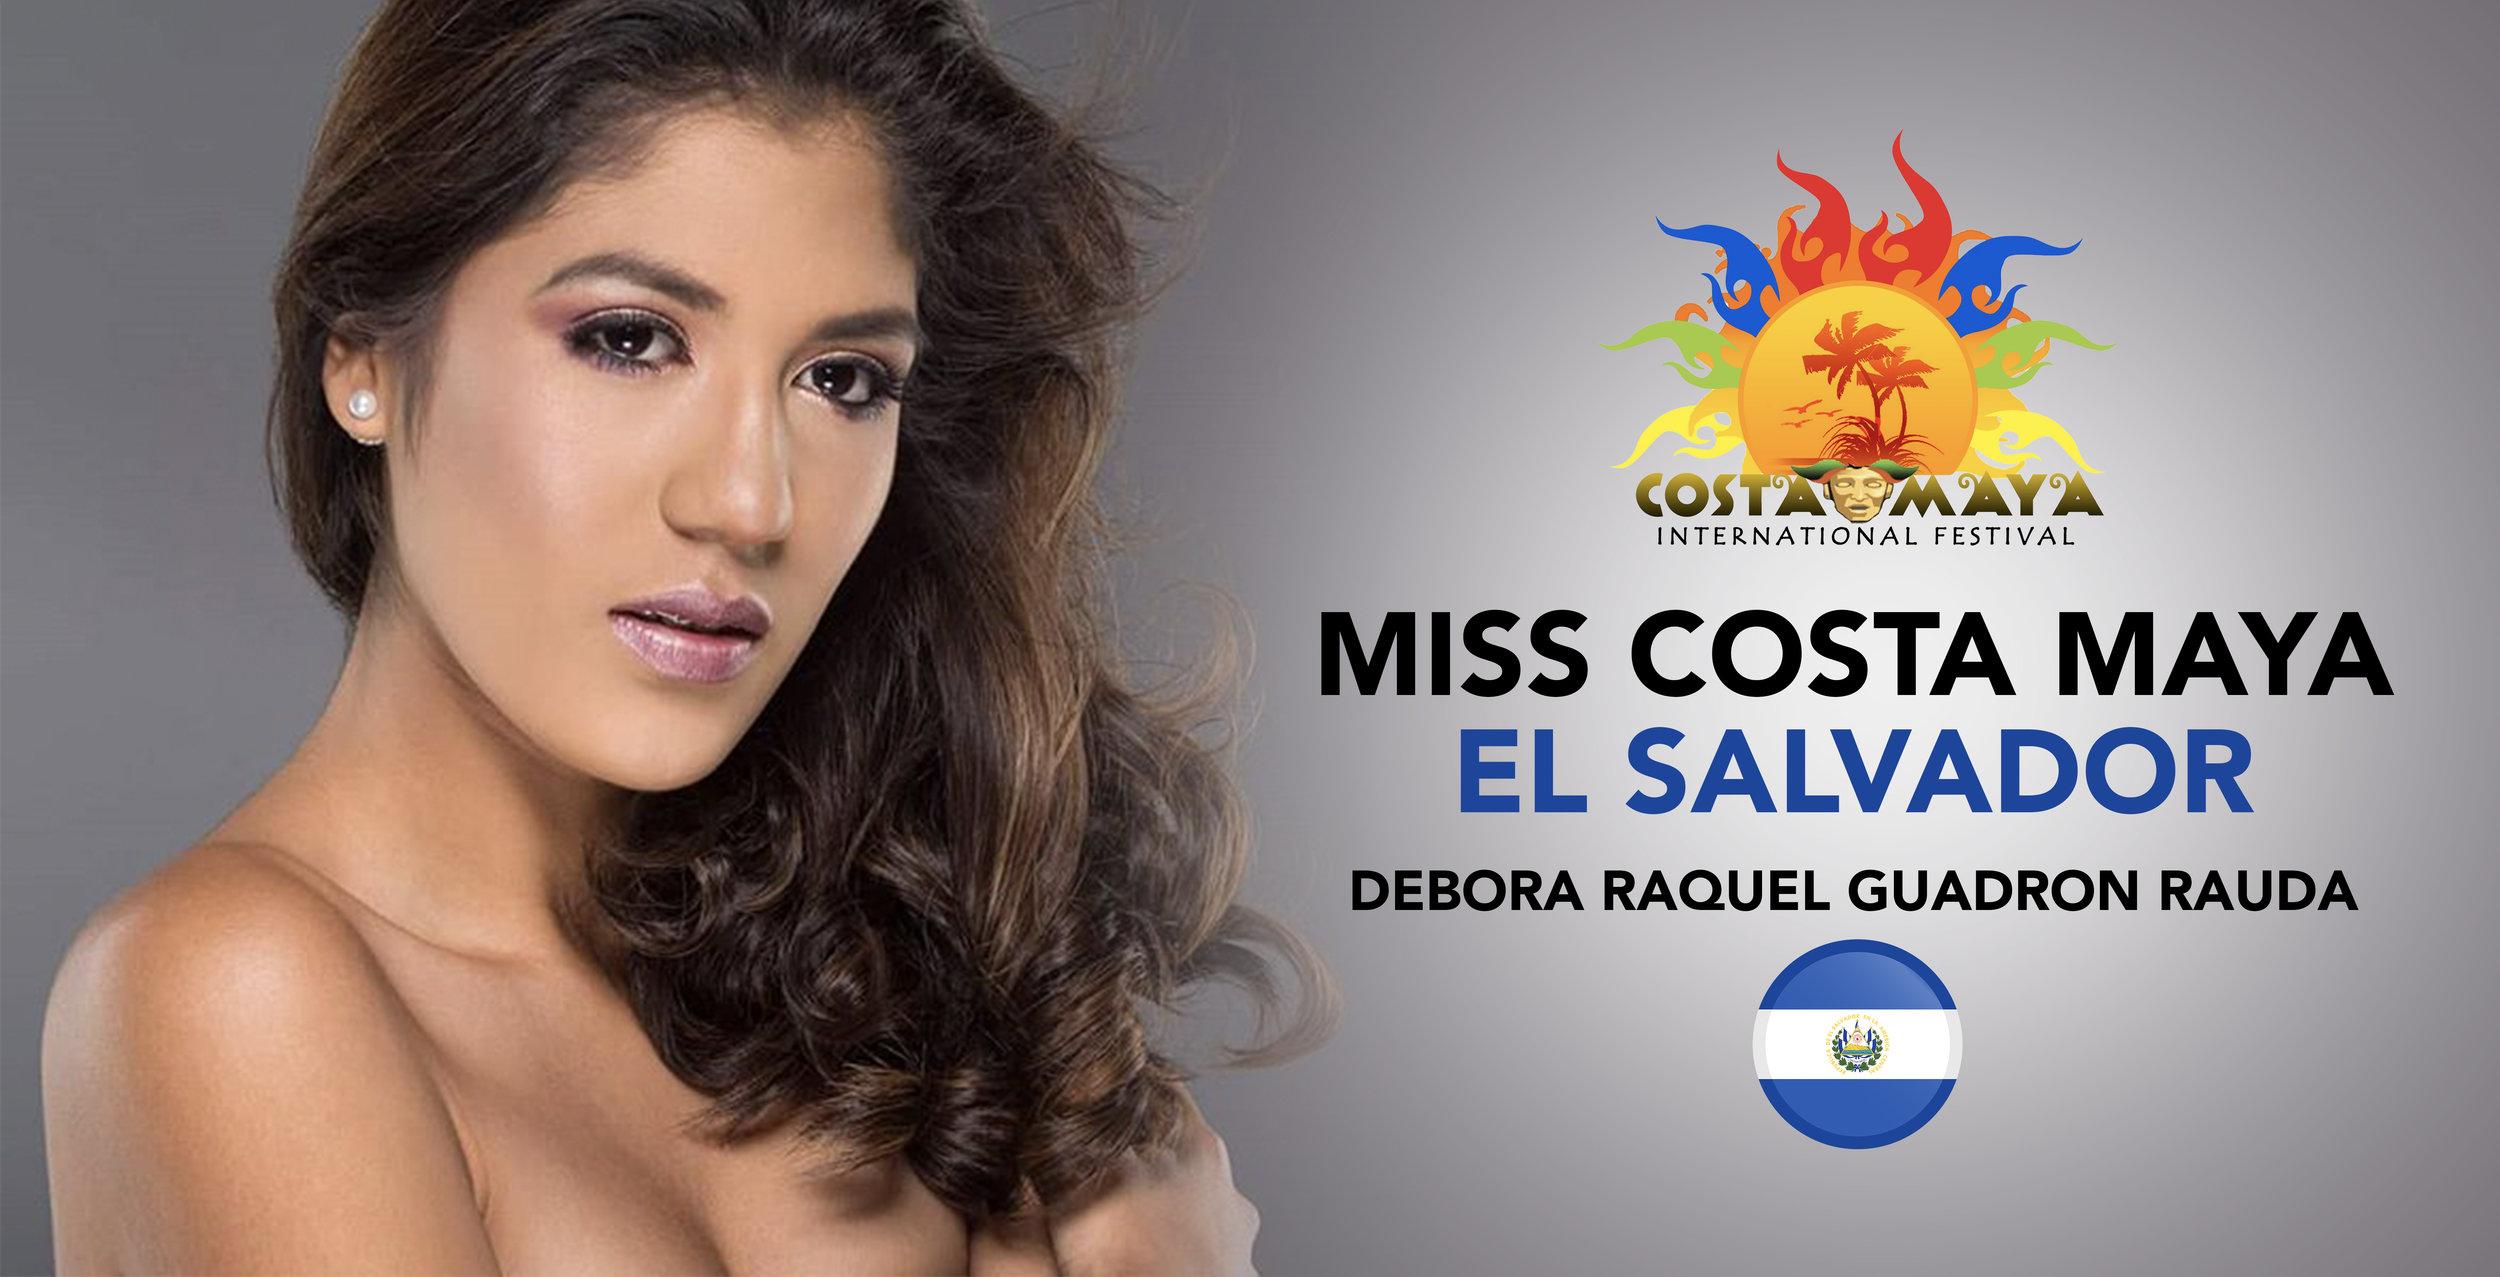 MISS COSTA MAYA EL SALVADOR.jpg